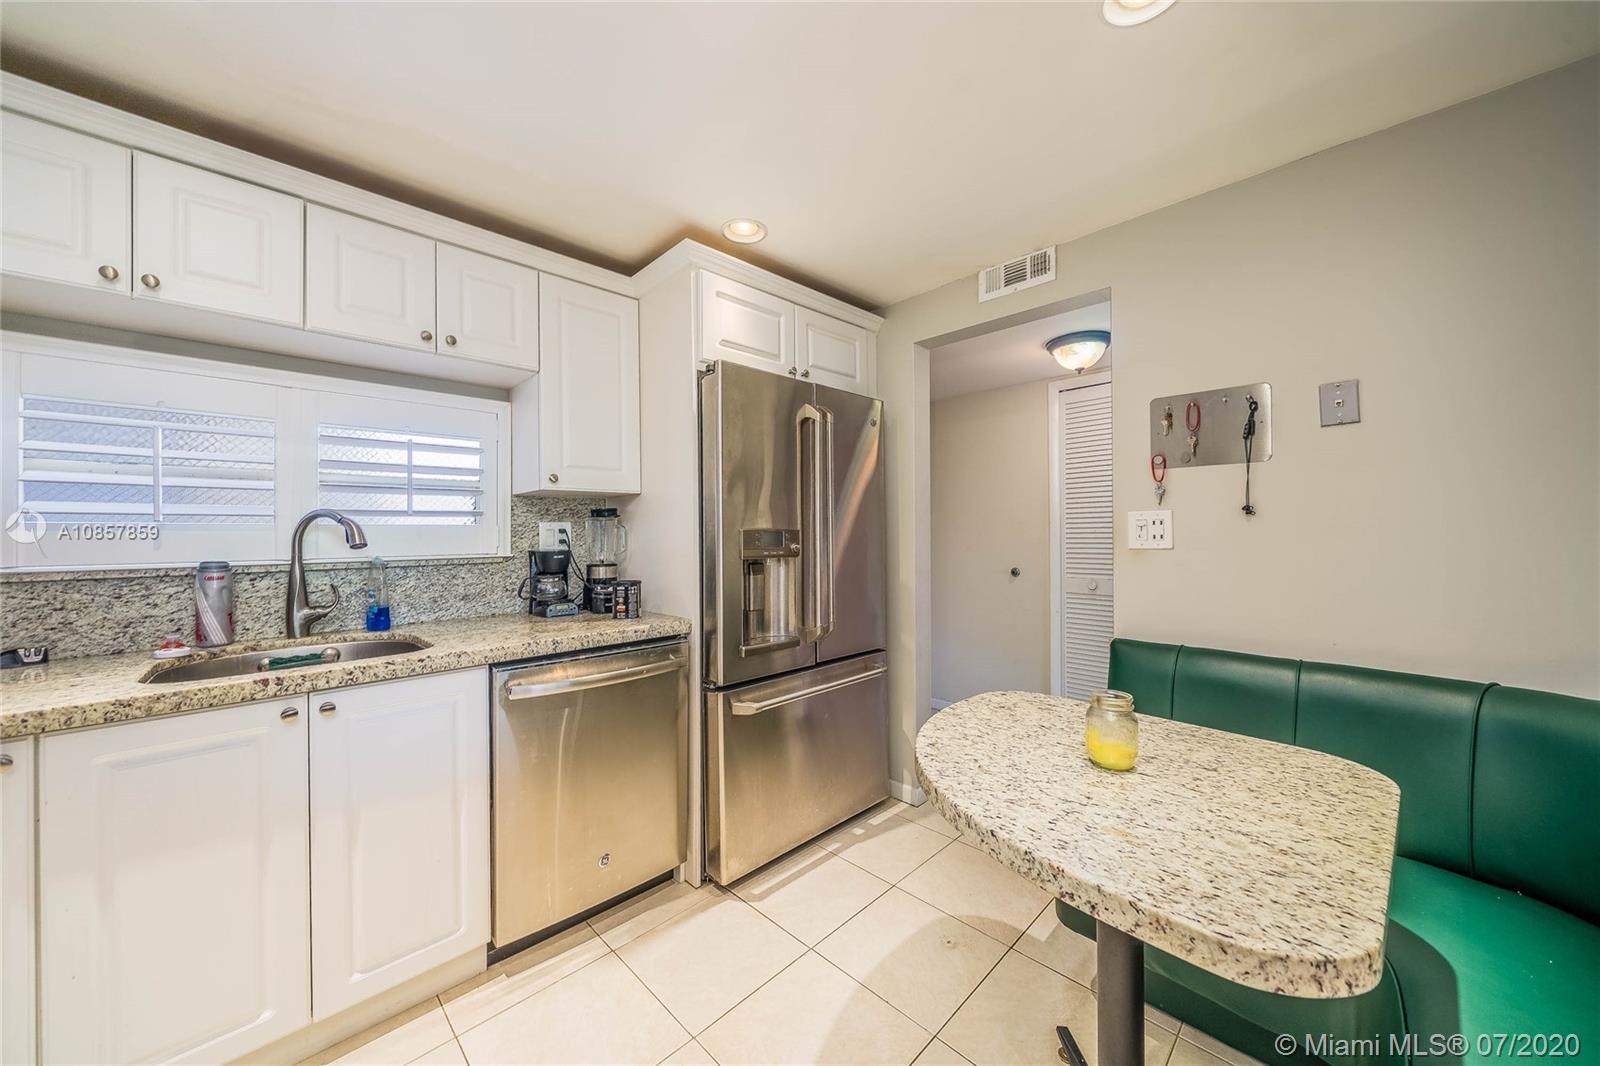 100 Ocean Lane Dr # 401, Key Biscayne, Florida 33149, 2 Bedrooms Bedrooms, ,2 BathroomsBathrooms,Residential,For Sale,100 Ocean Lane Dr # 401,A10857859